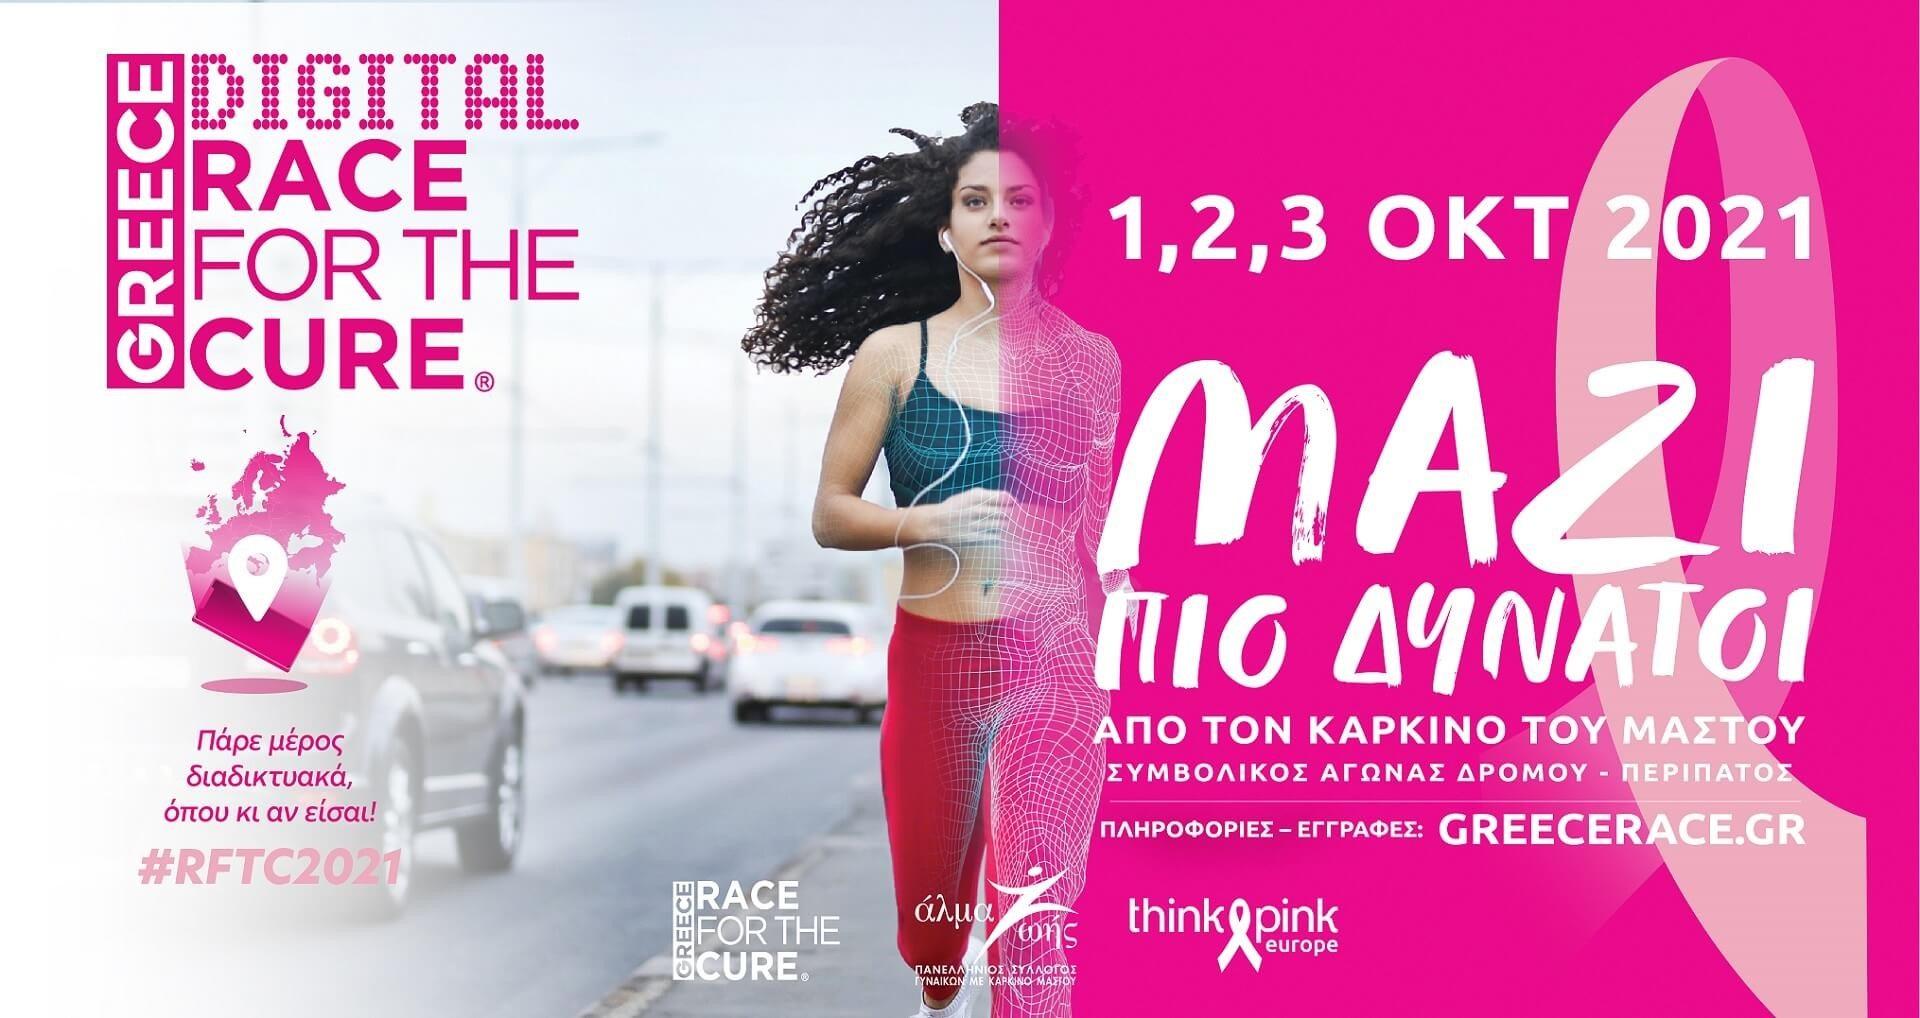 H AstraZeneca για 5η συνεχή χρονιά επίσημος χορηγός του Greece Race for the Cure®